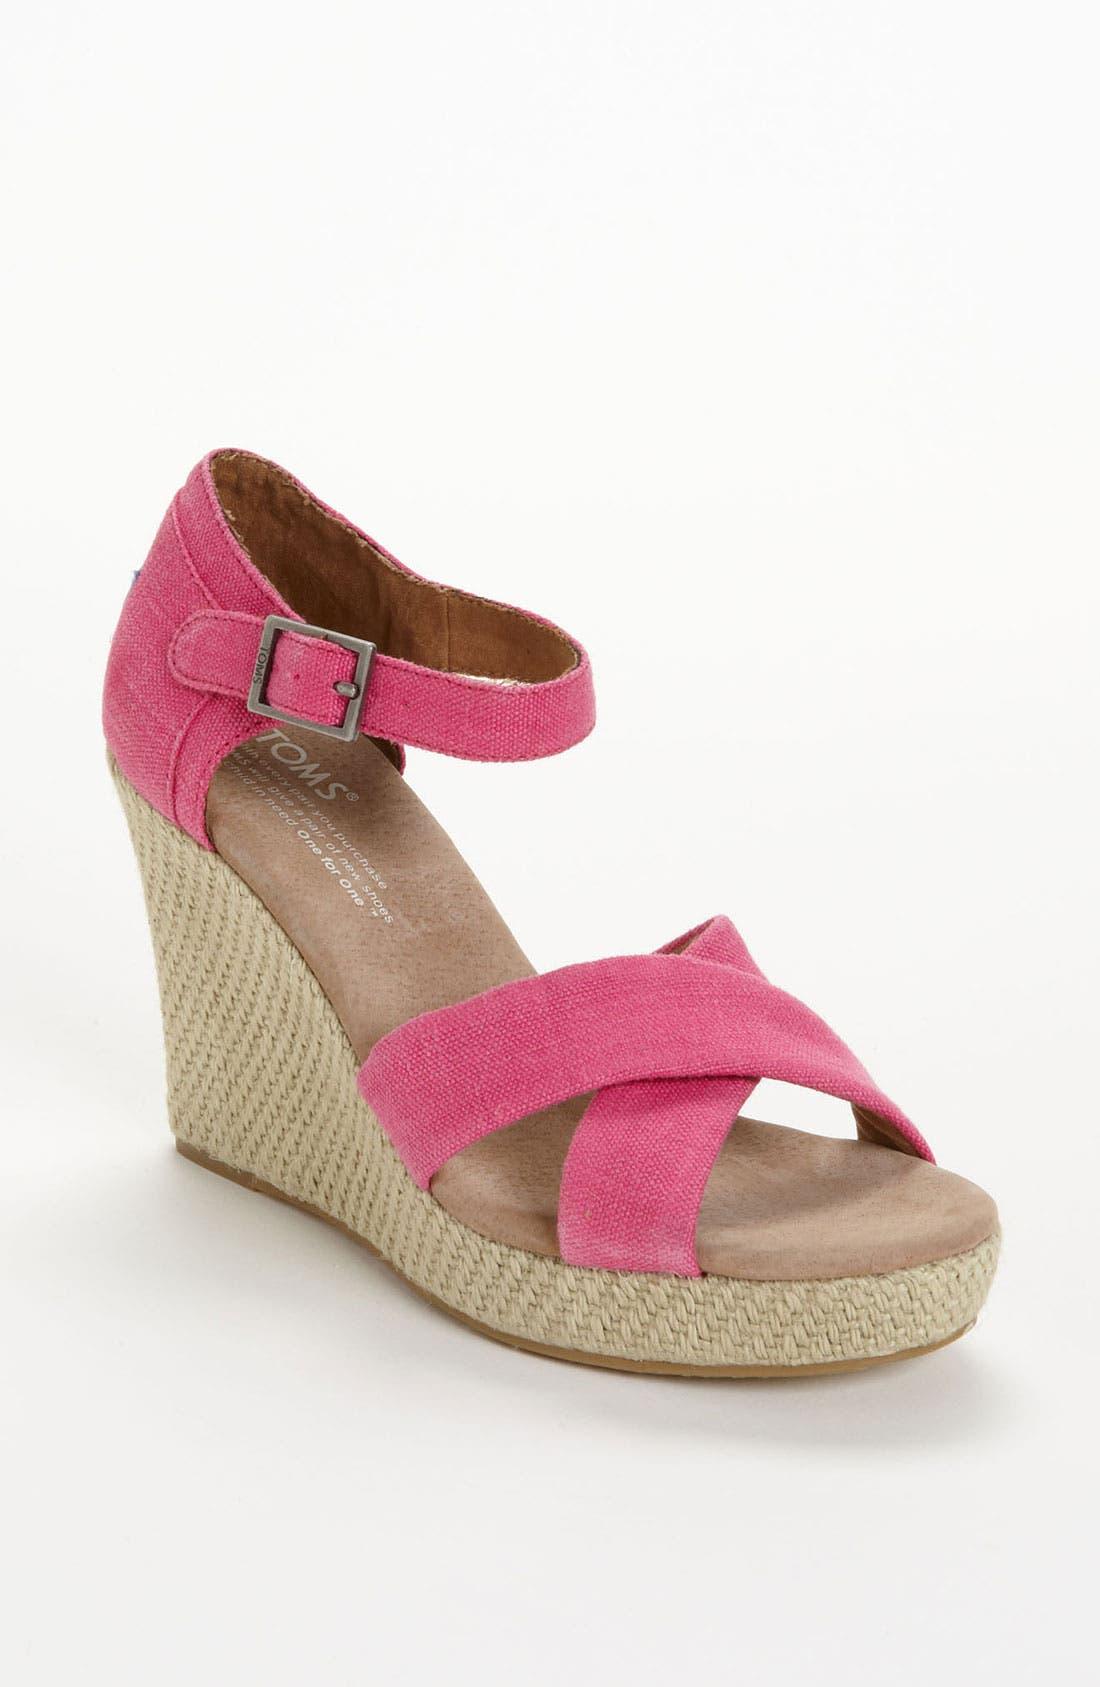 Alternate Image 1 Selected - TOMS Hemp Wedge Sandal